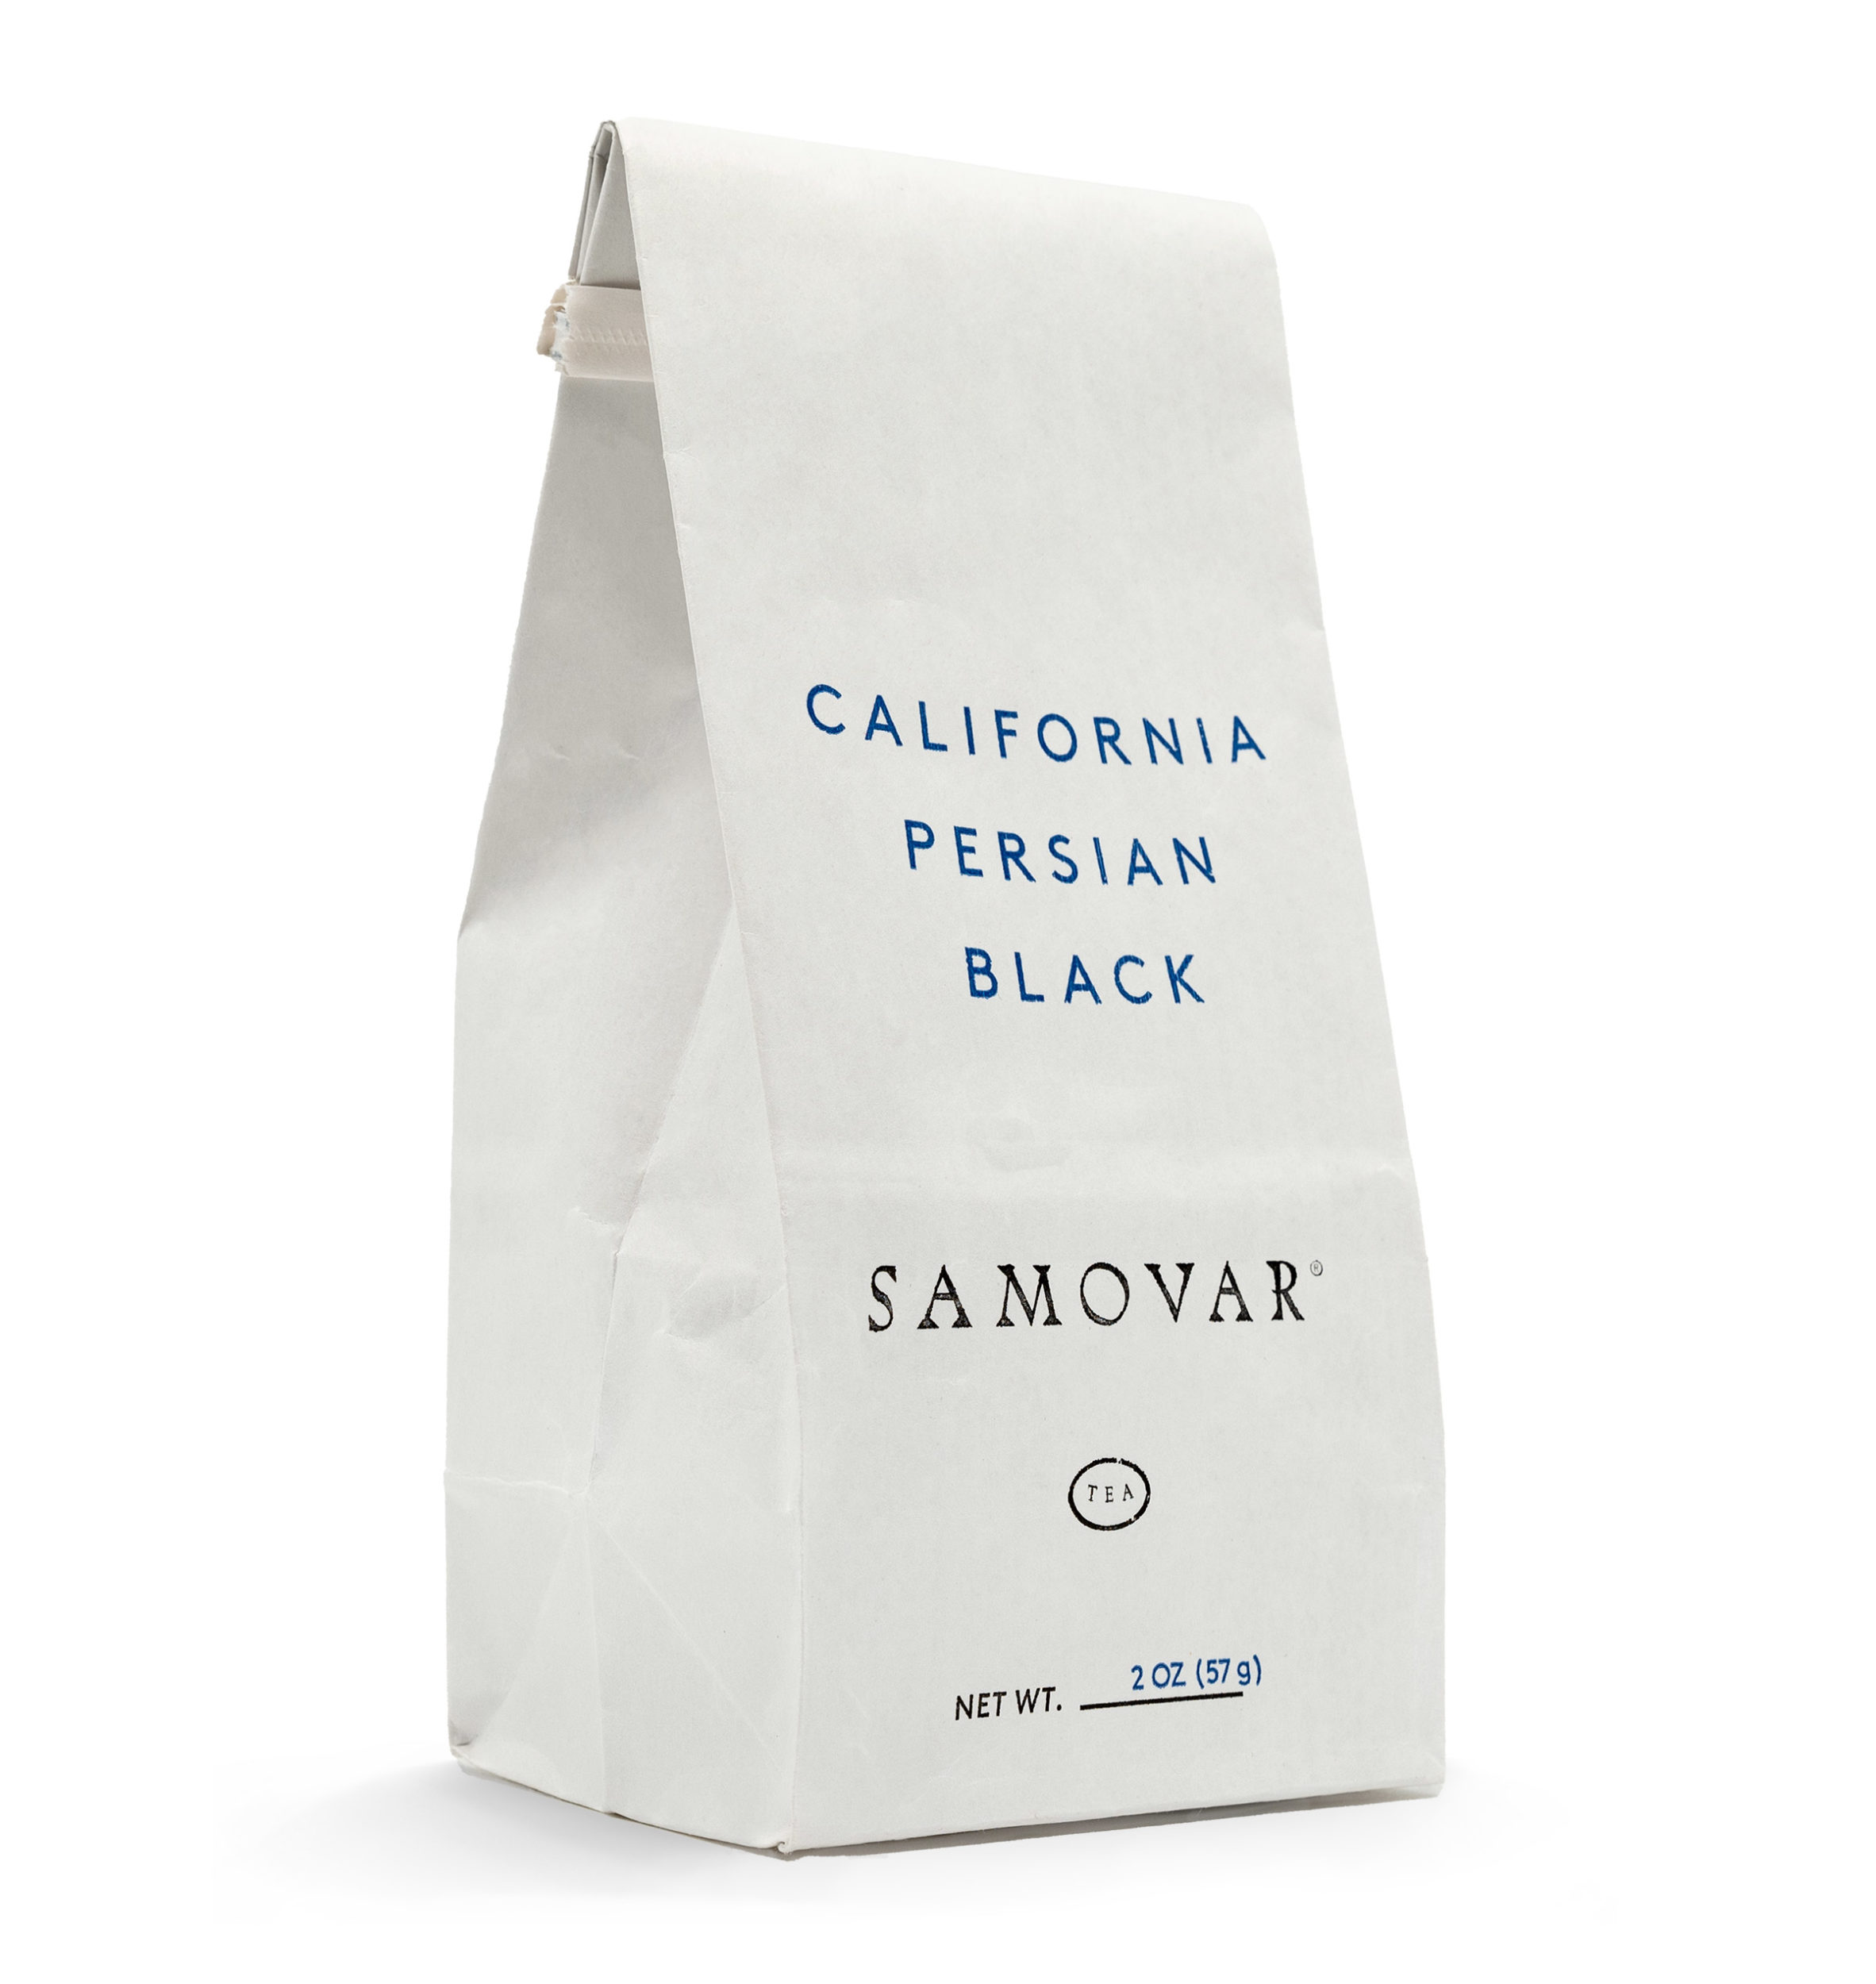 California Persian - White Bag - Front - 0402CAPEBG